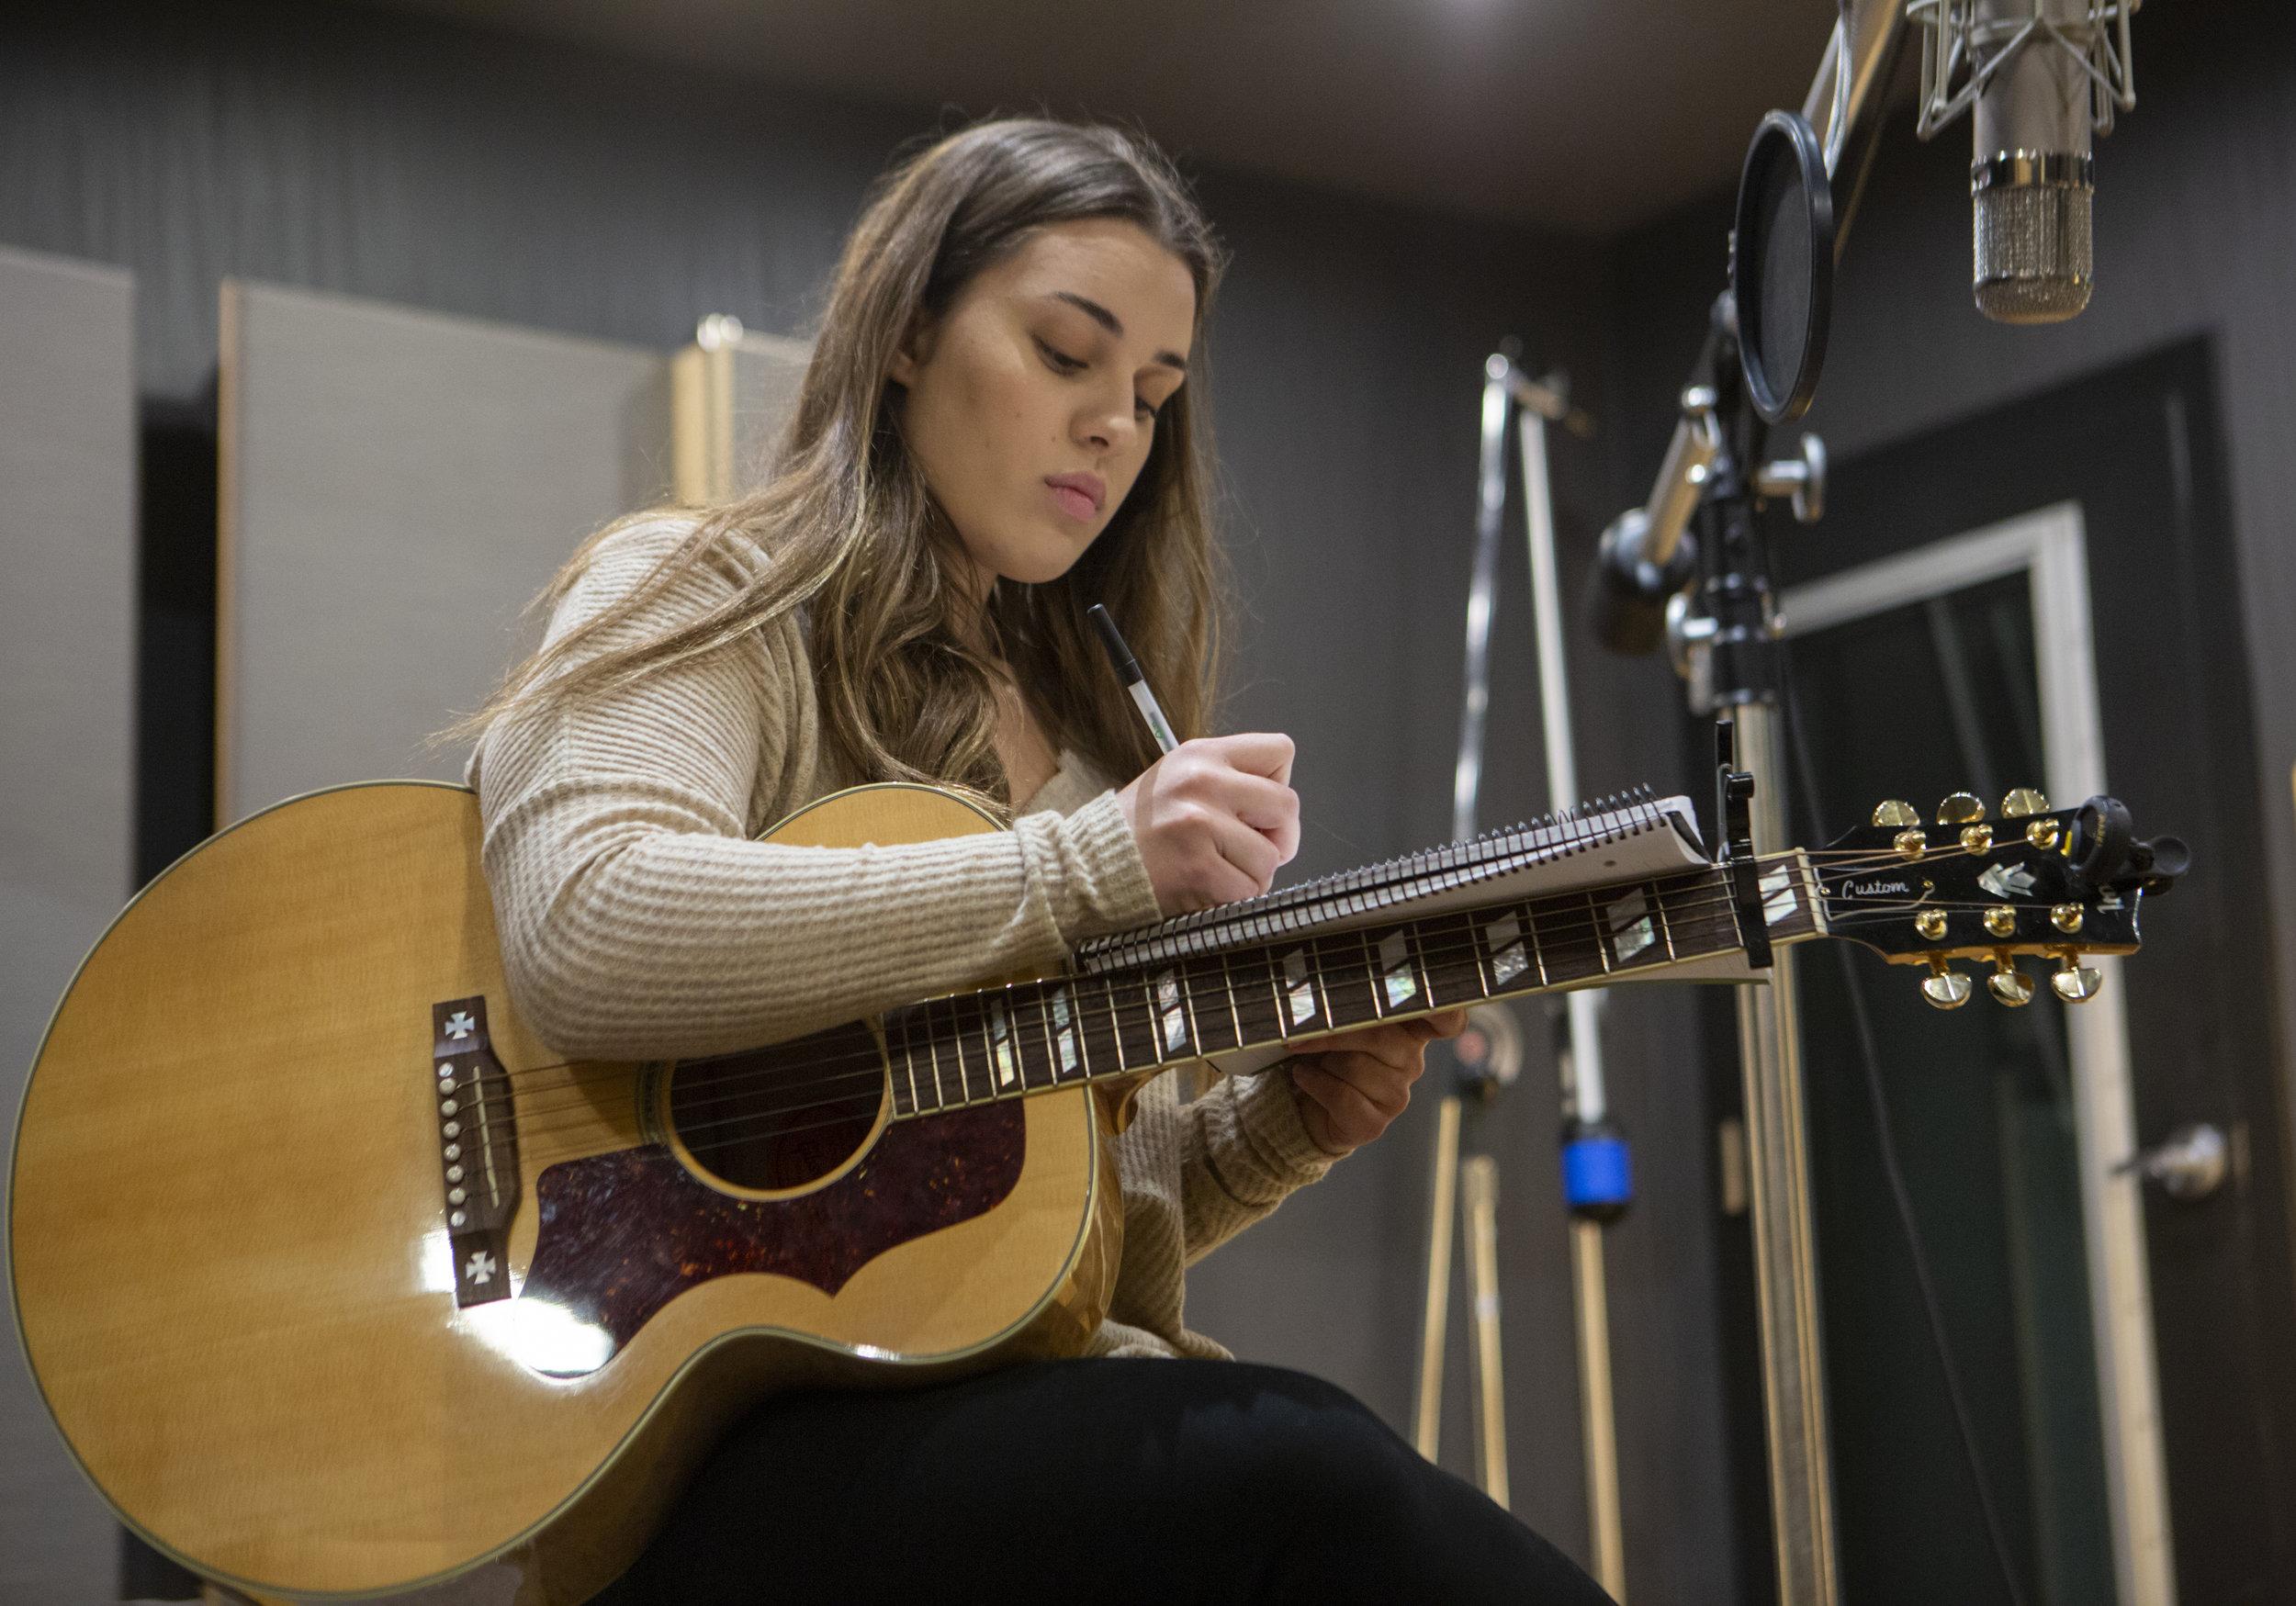 artist program - Songwriting& Moto records